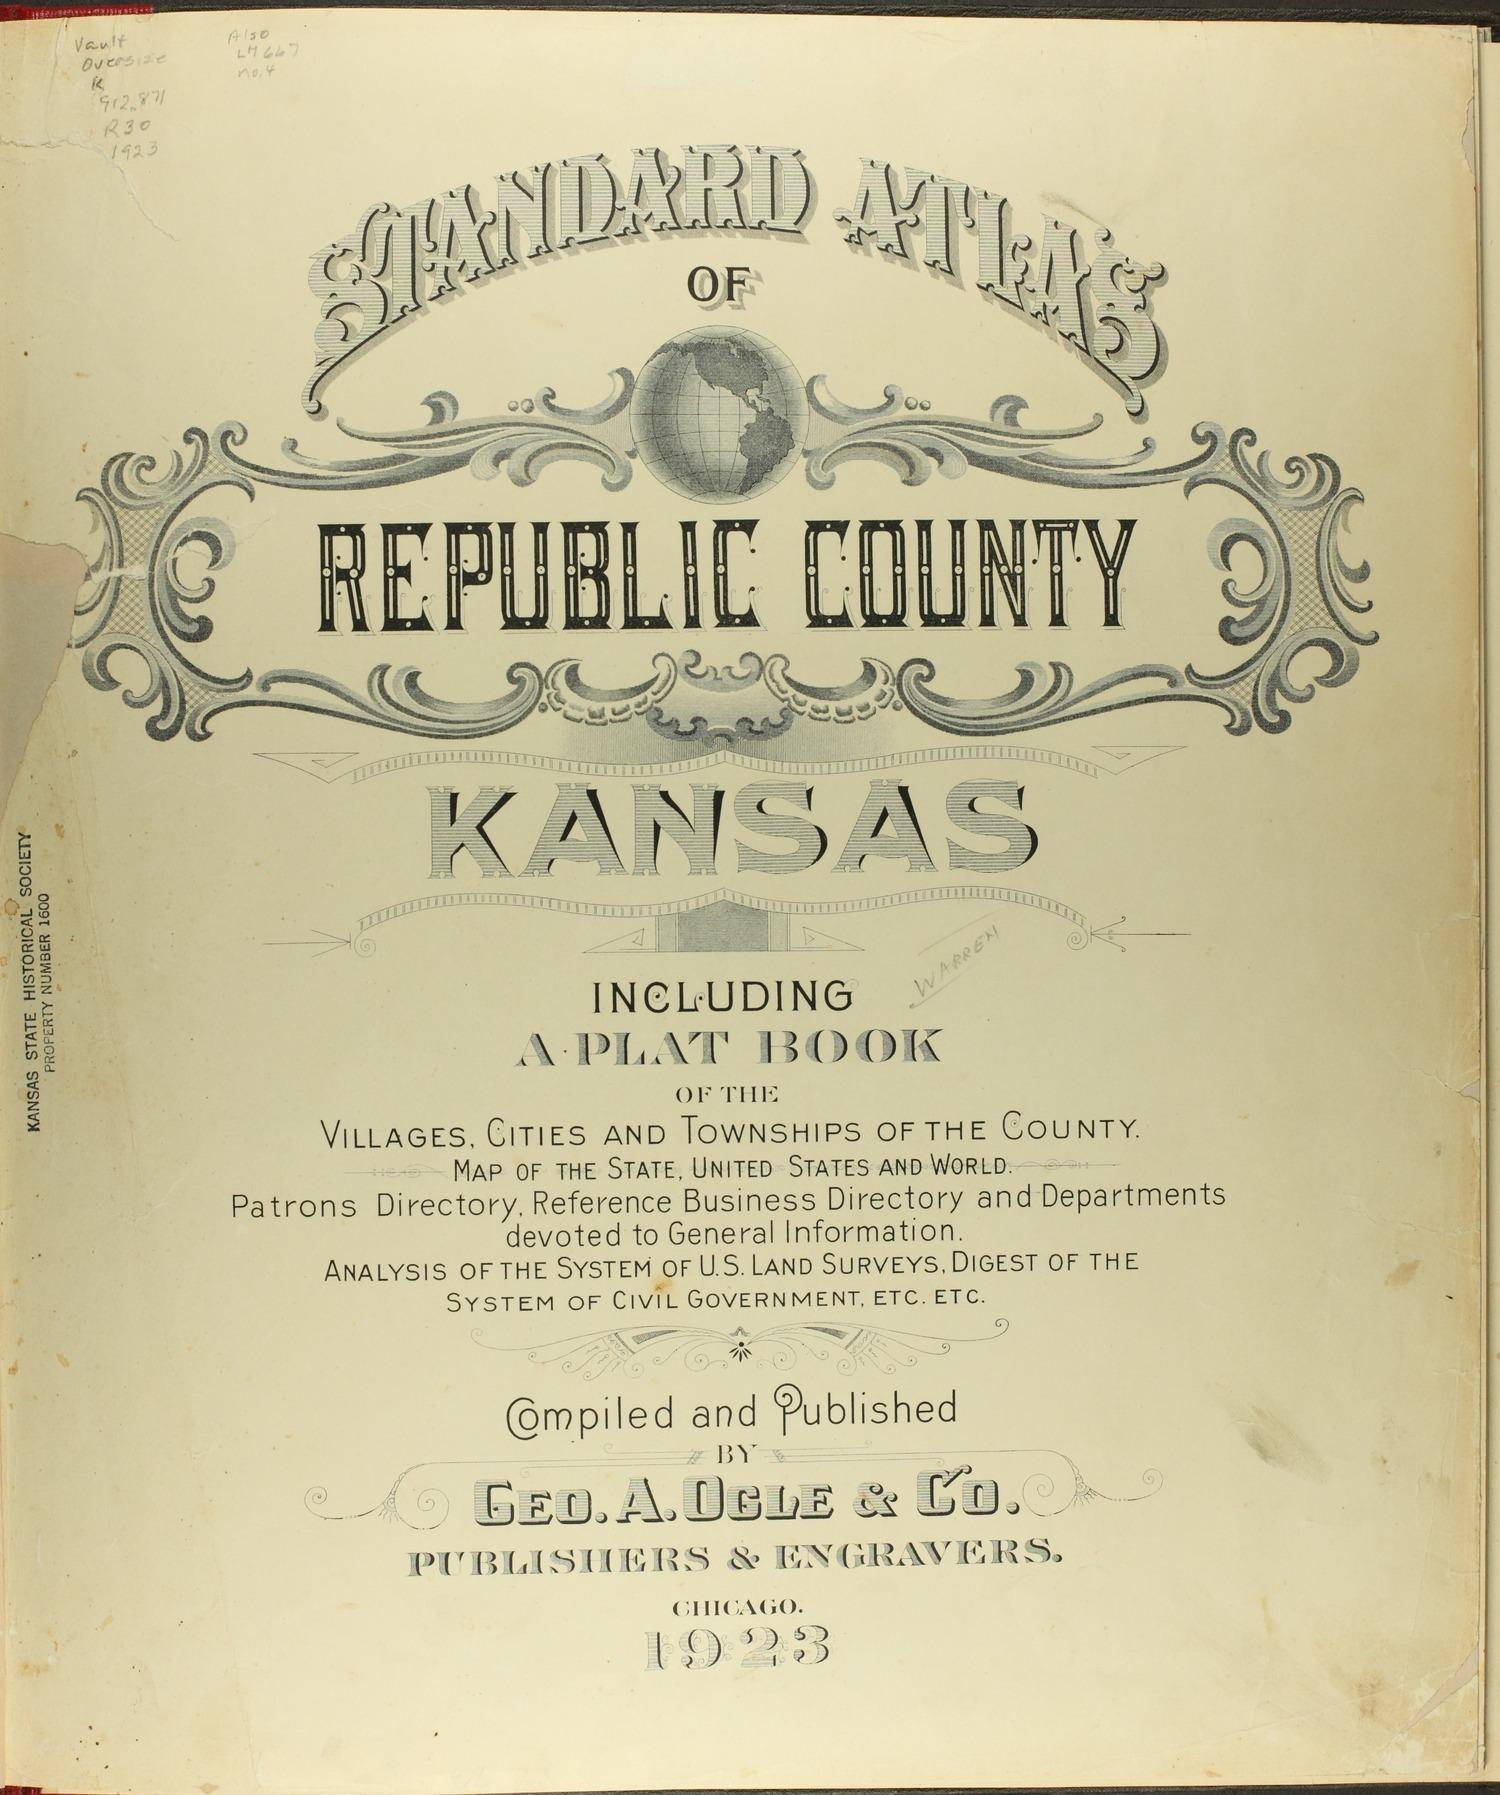 Standard atlas of Republic County, Kansas - Title Page